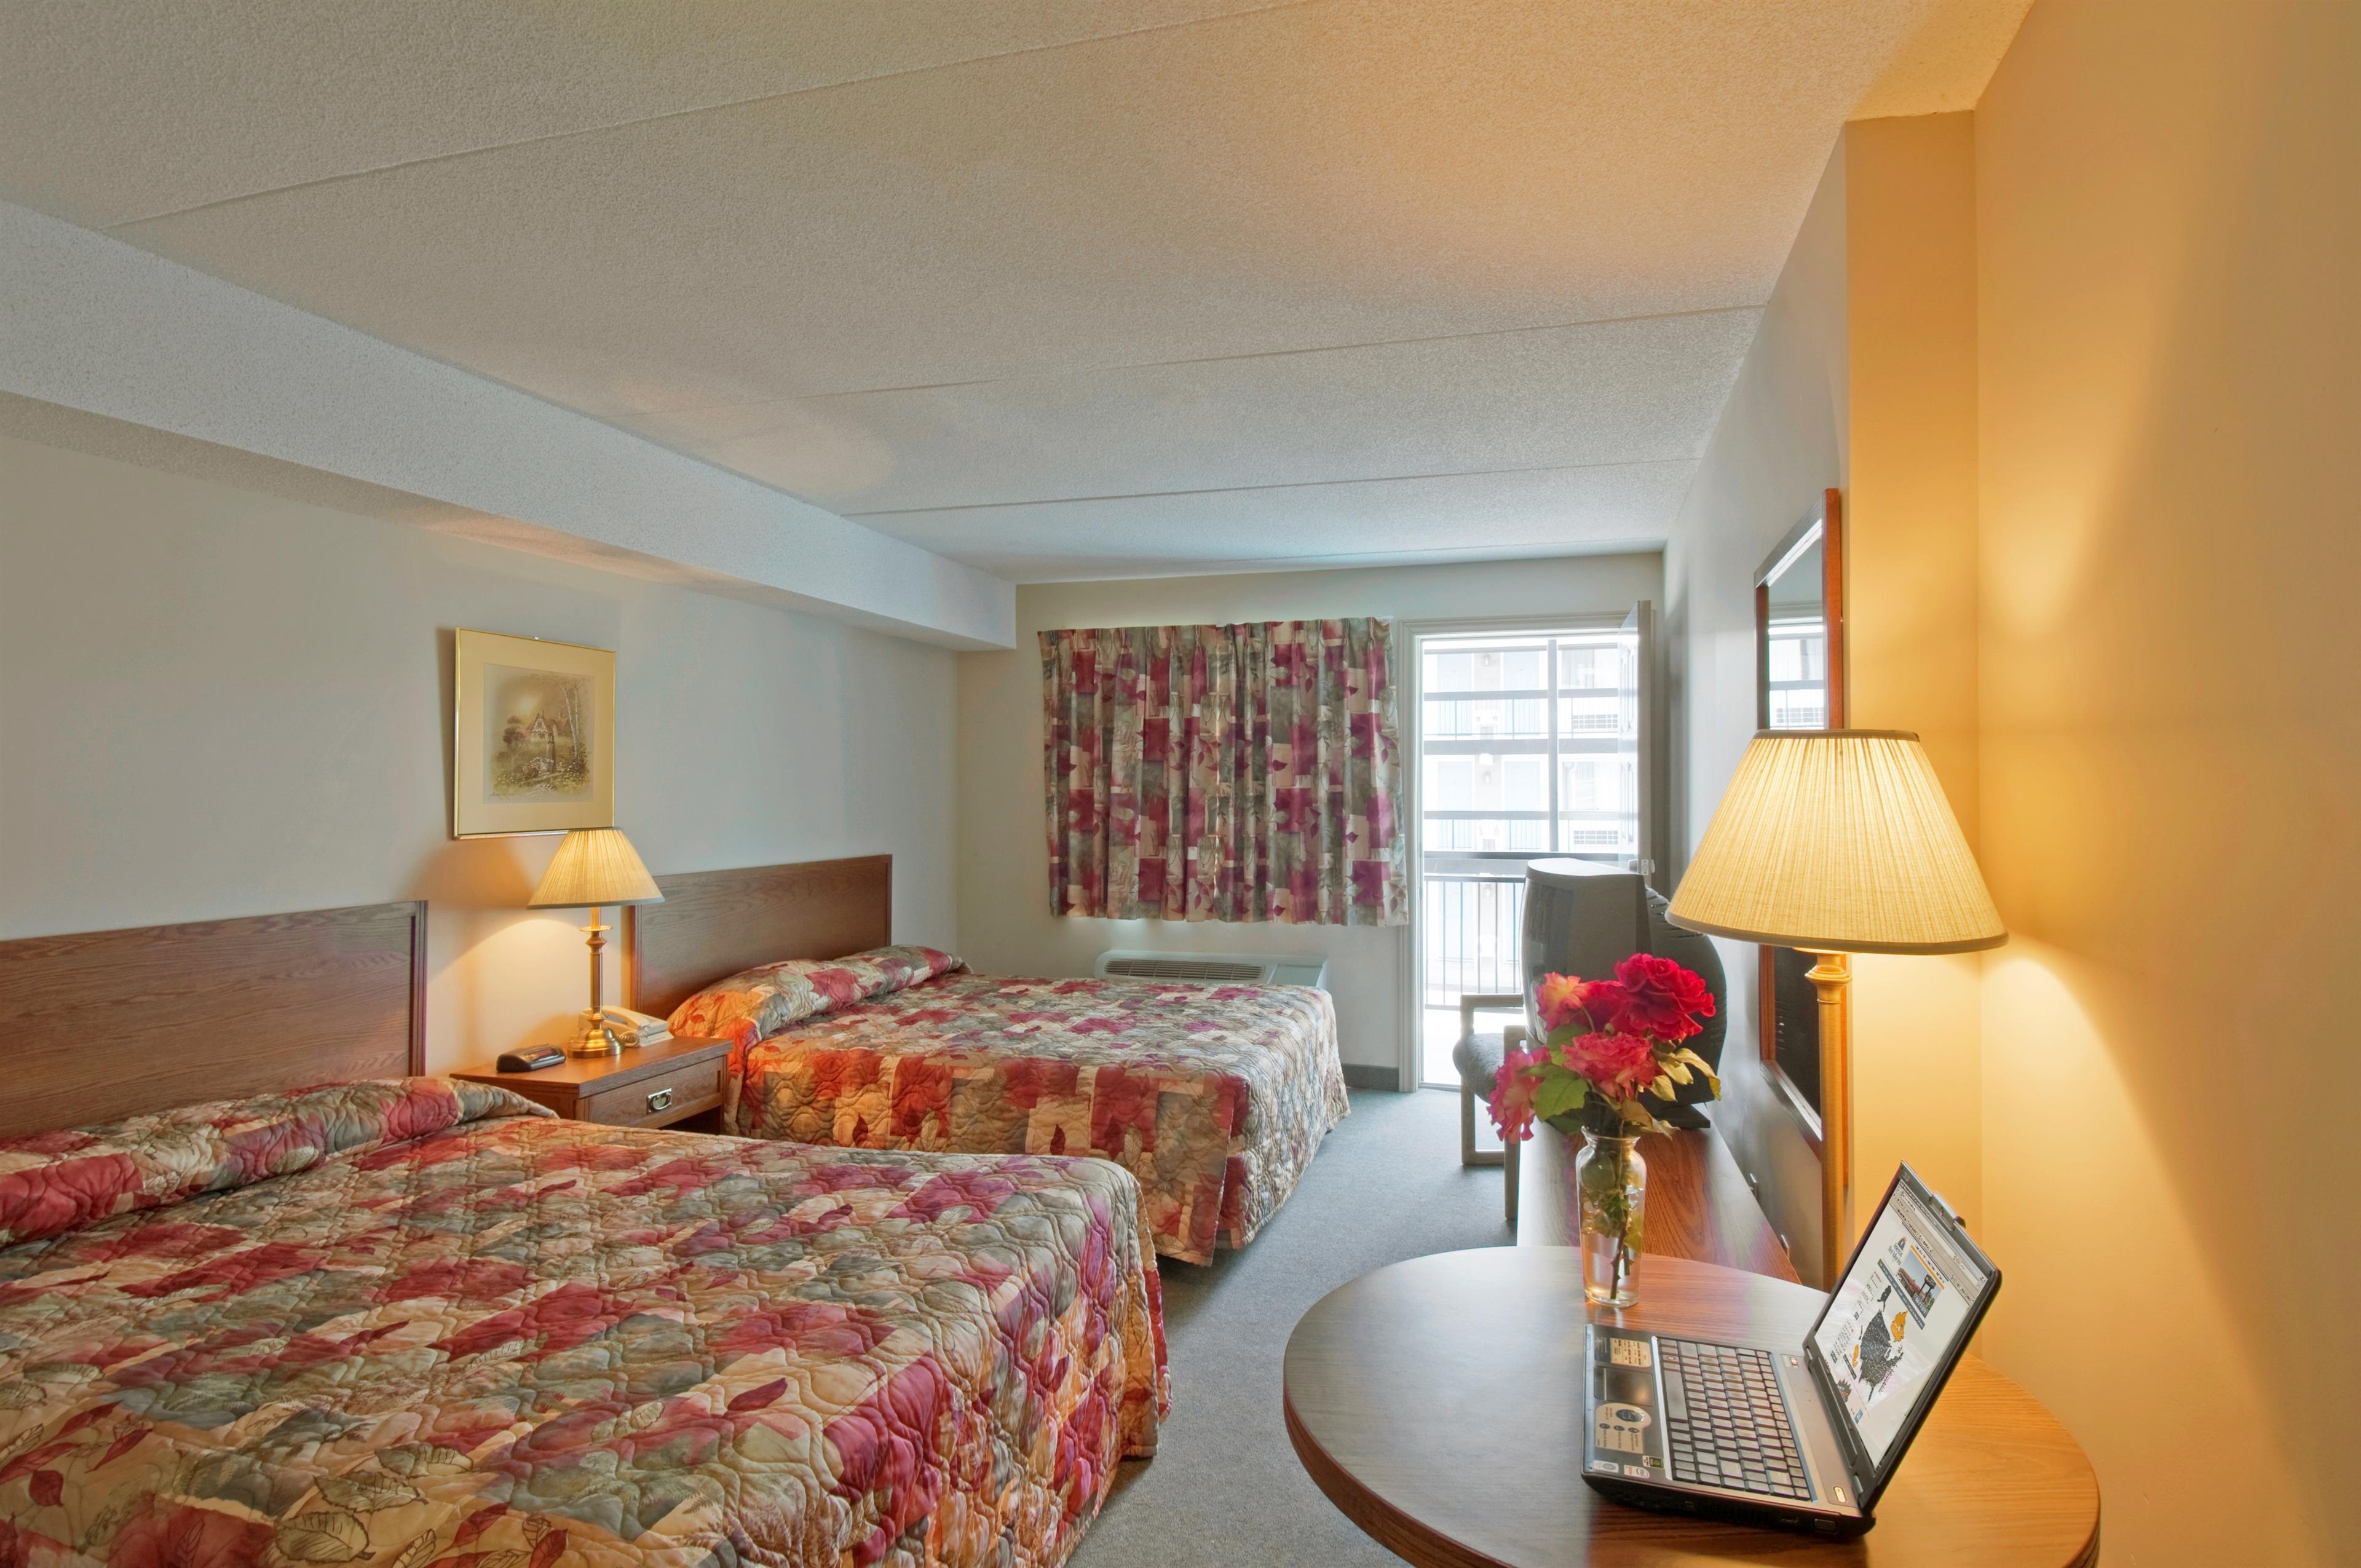 Americas Best Value Inn And Suites International Falls Americas Best Value Inn Suites Niagara Falls In Niagara Falls